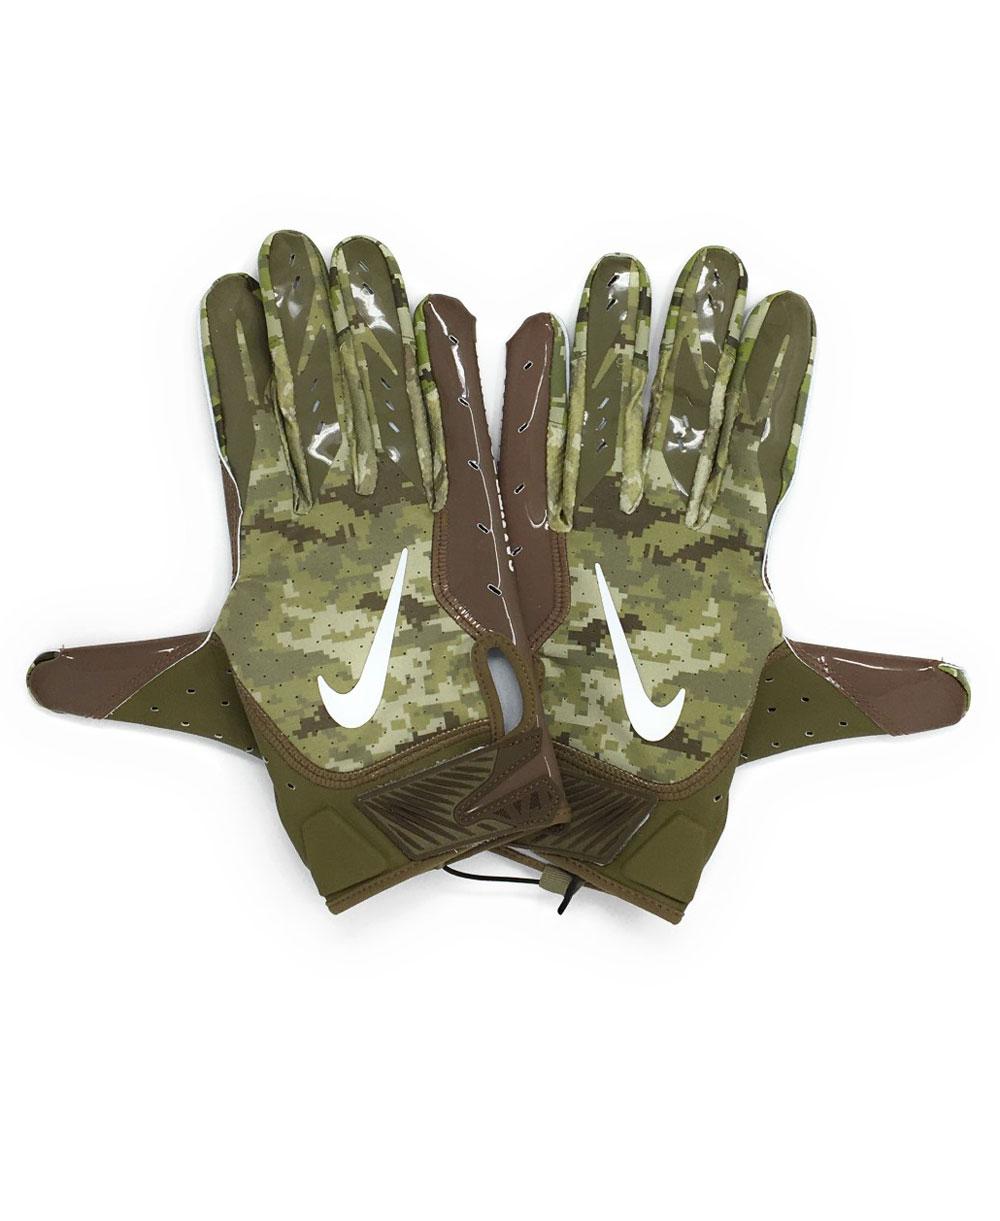 Vapor Jet 5 Salute To Service NFL Guanti Football Americano Uomo Trooper/Brown